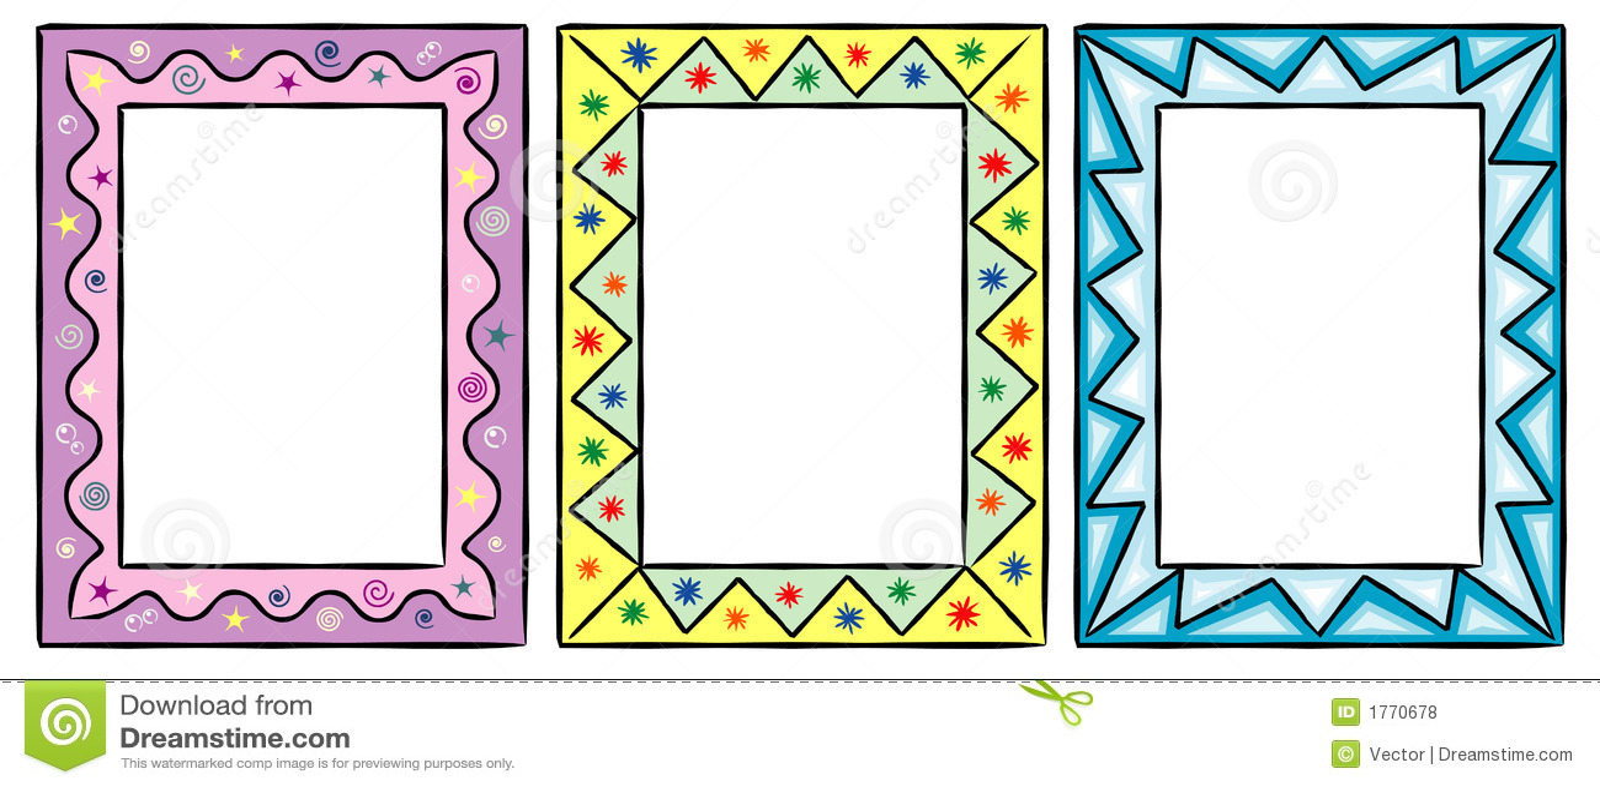 Set Of Funny Decorative Frames Stock Vector - Illustration of border ...